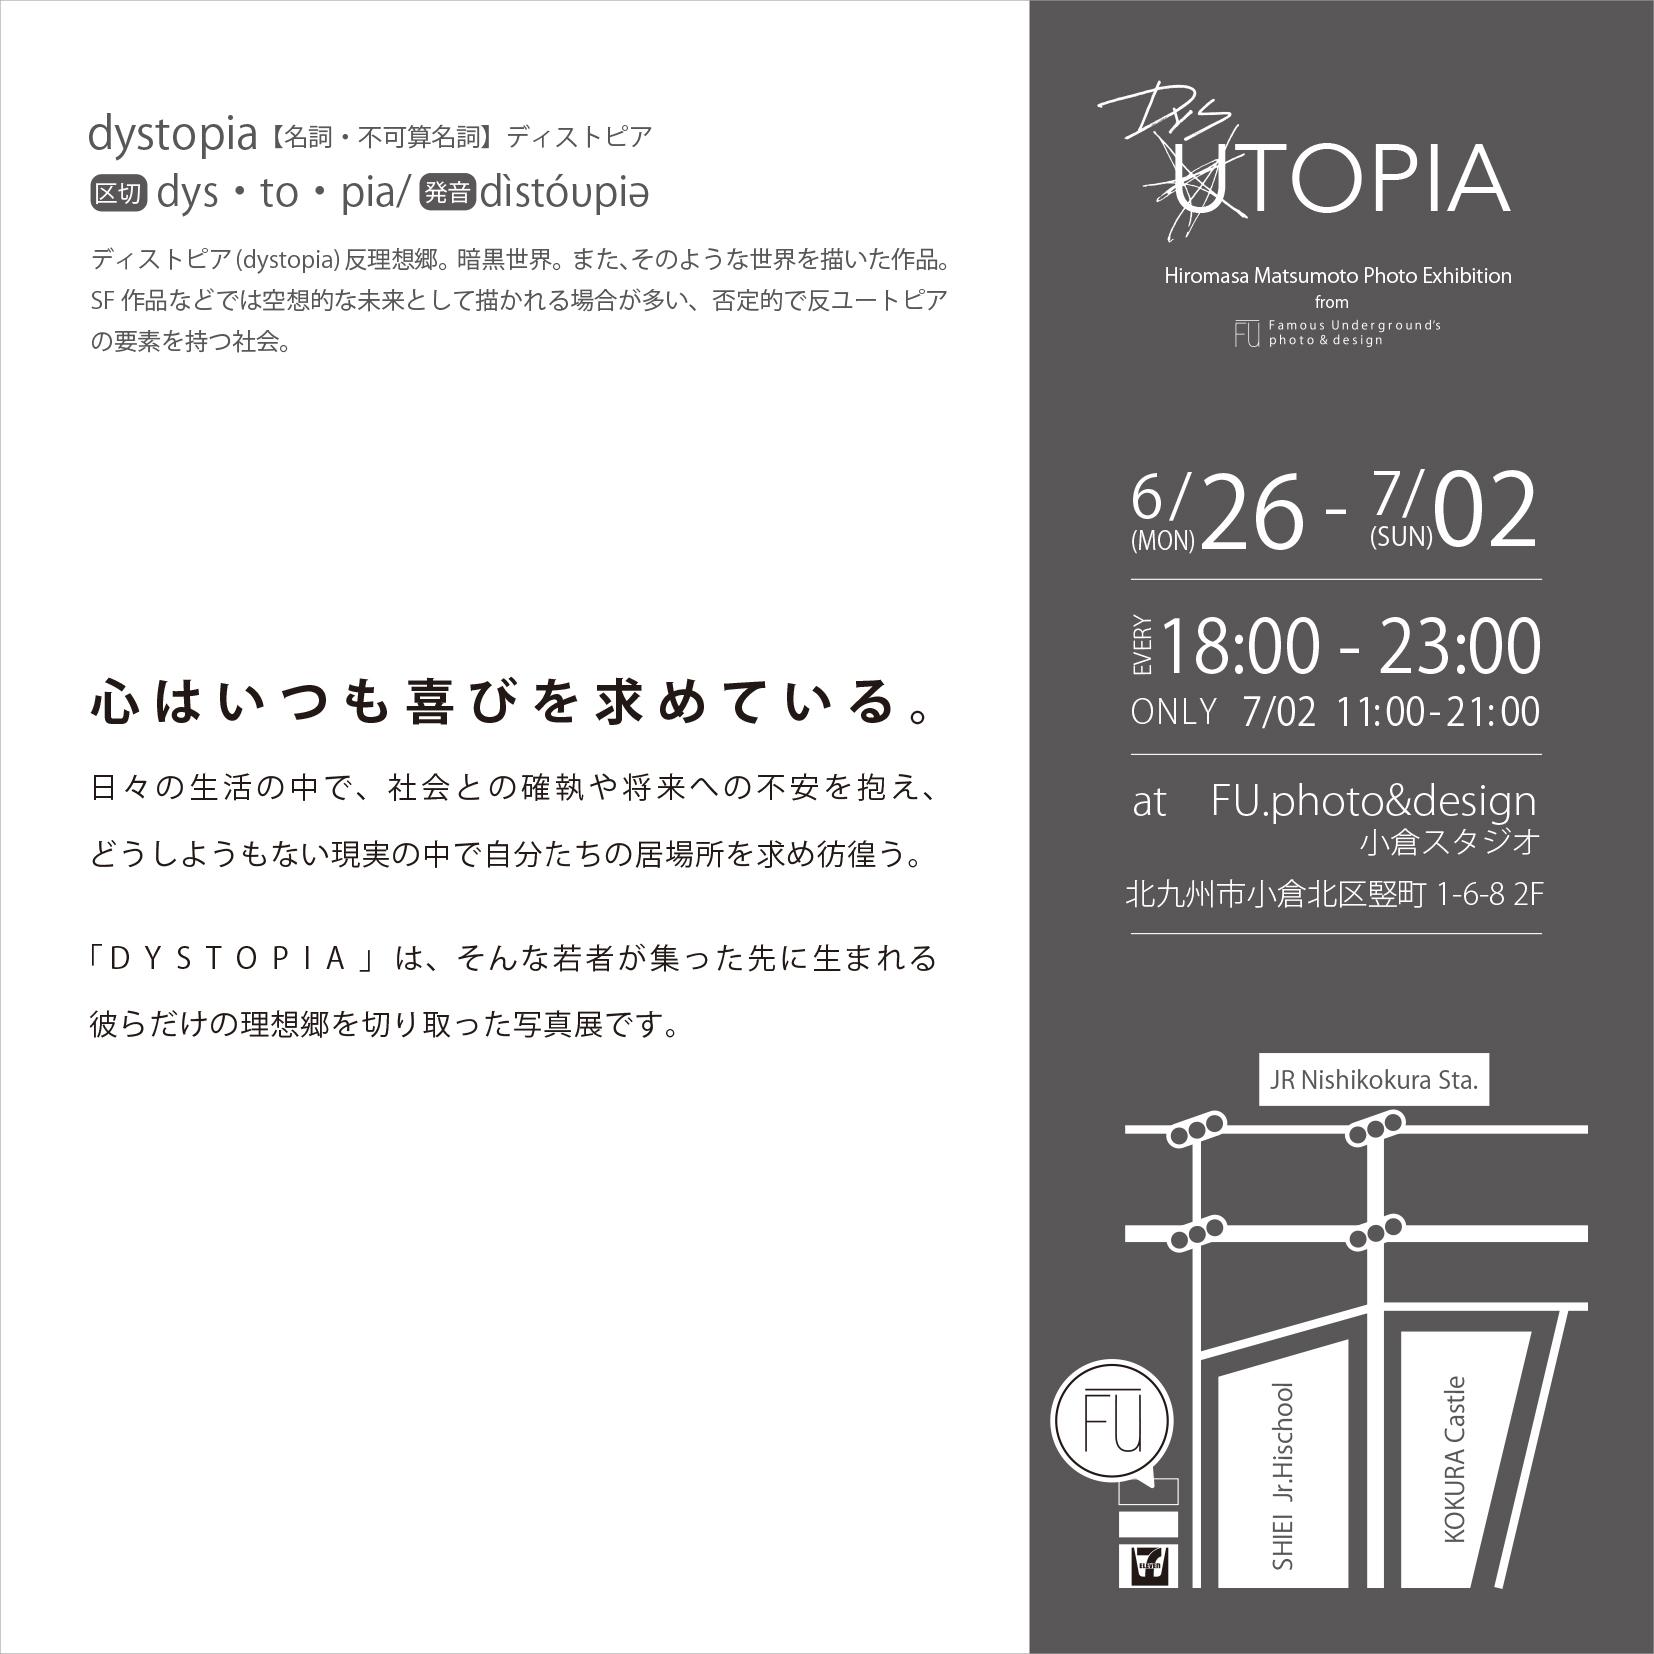 dystopia_sq裏_2